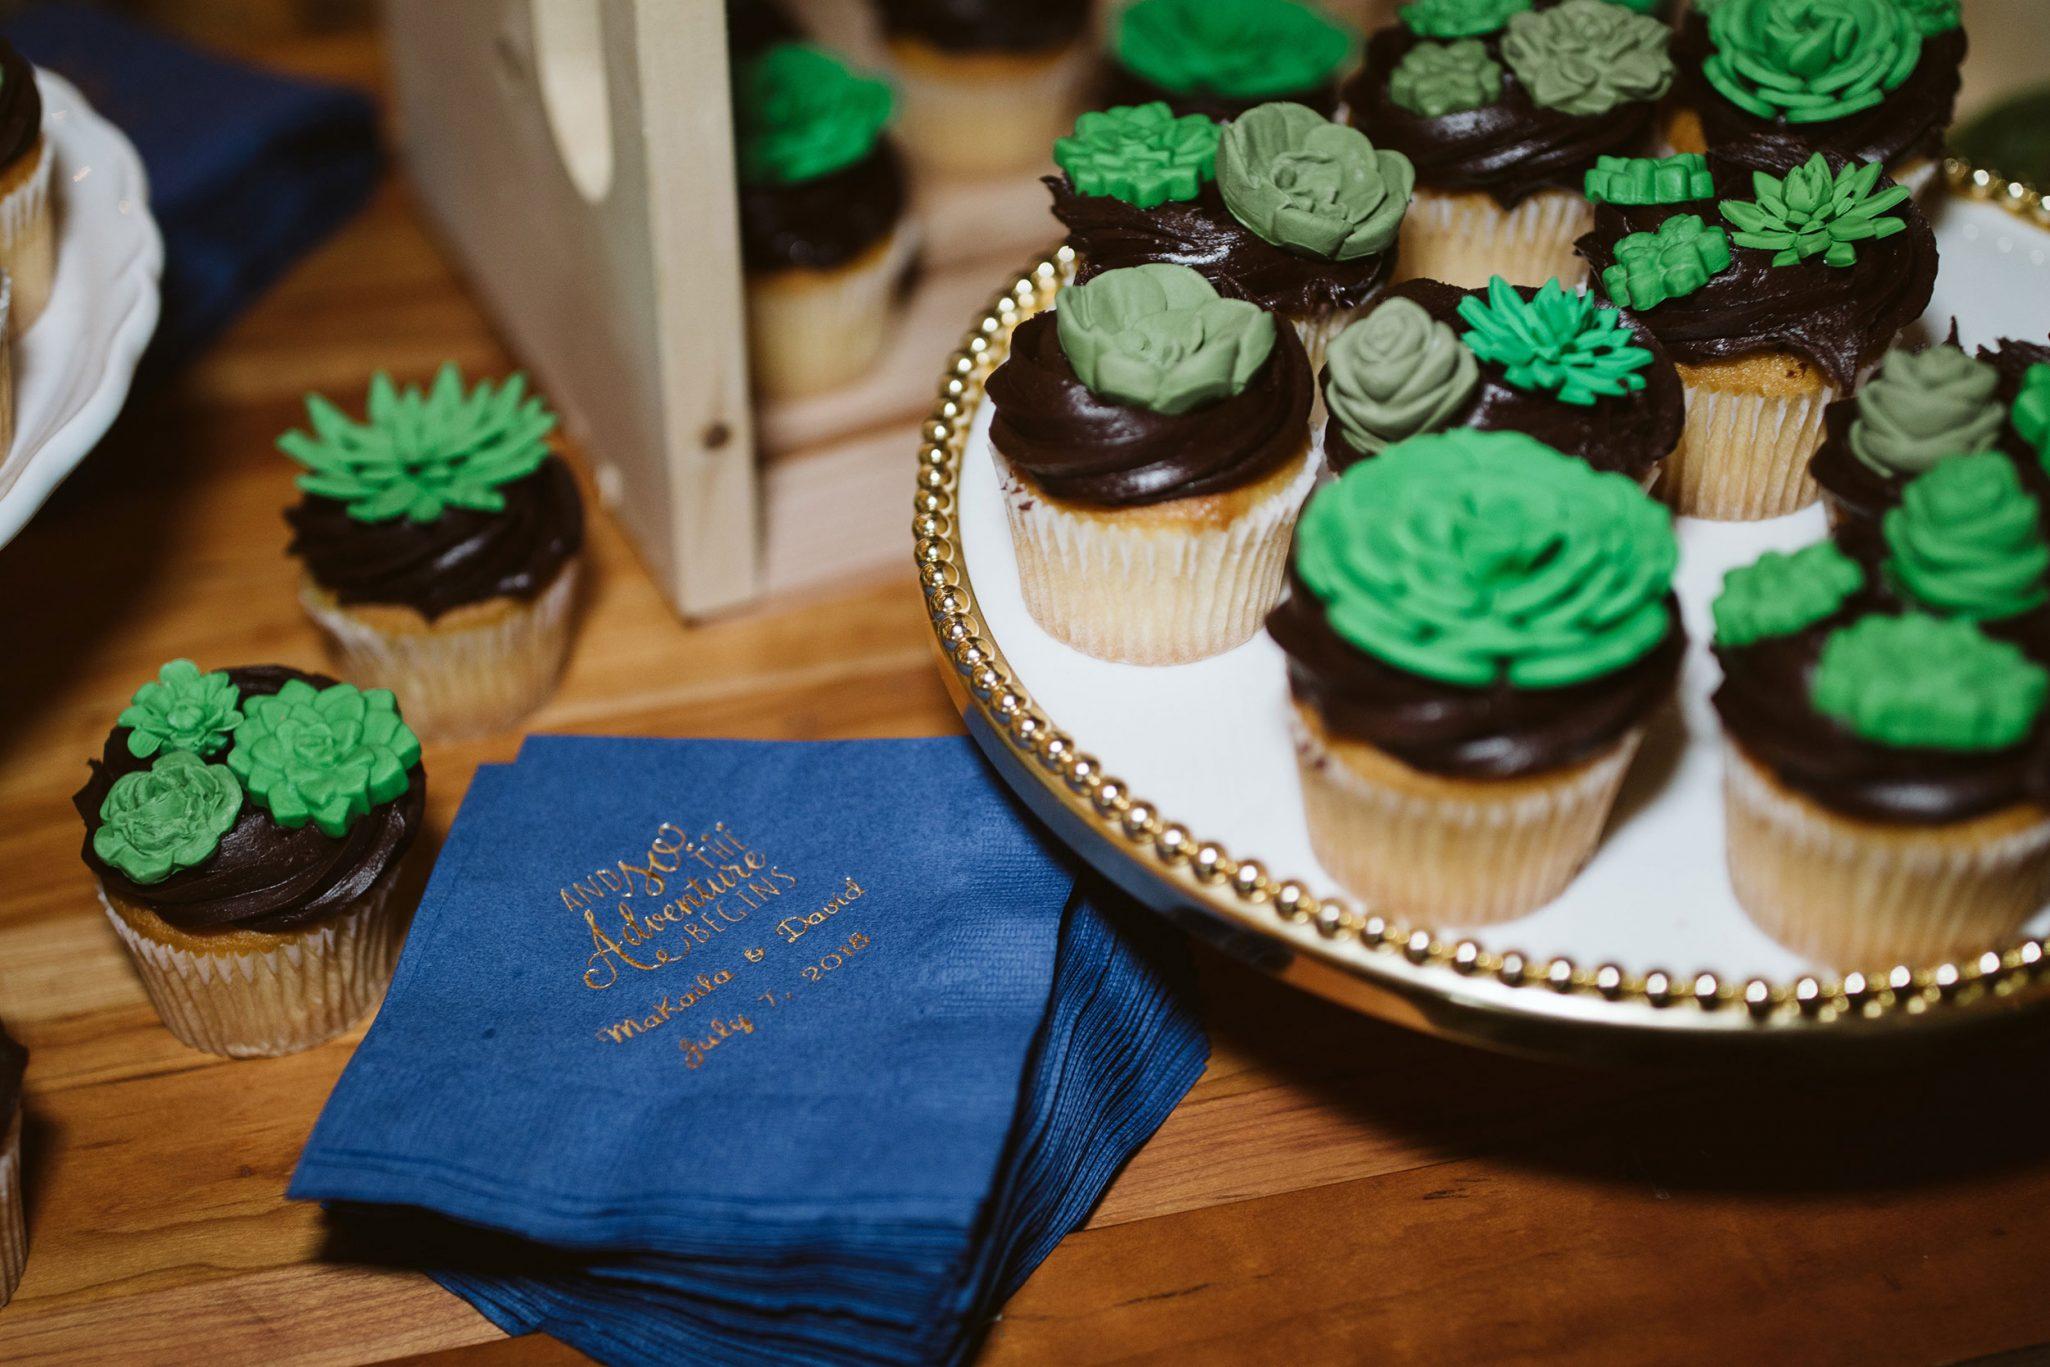 Reception details - cupcakes